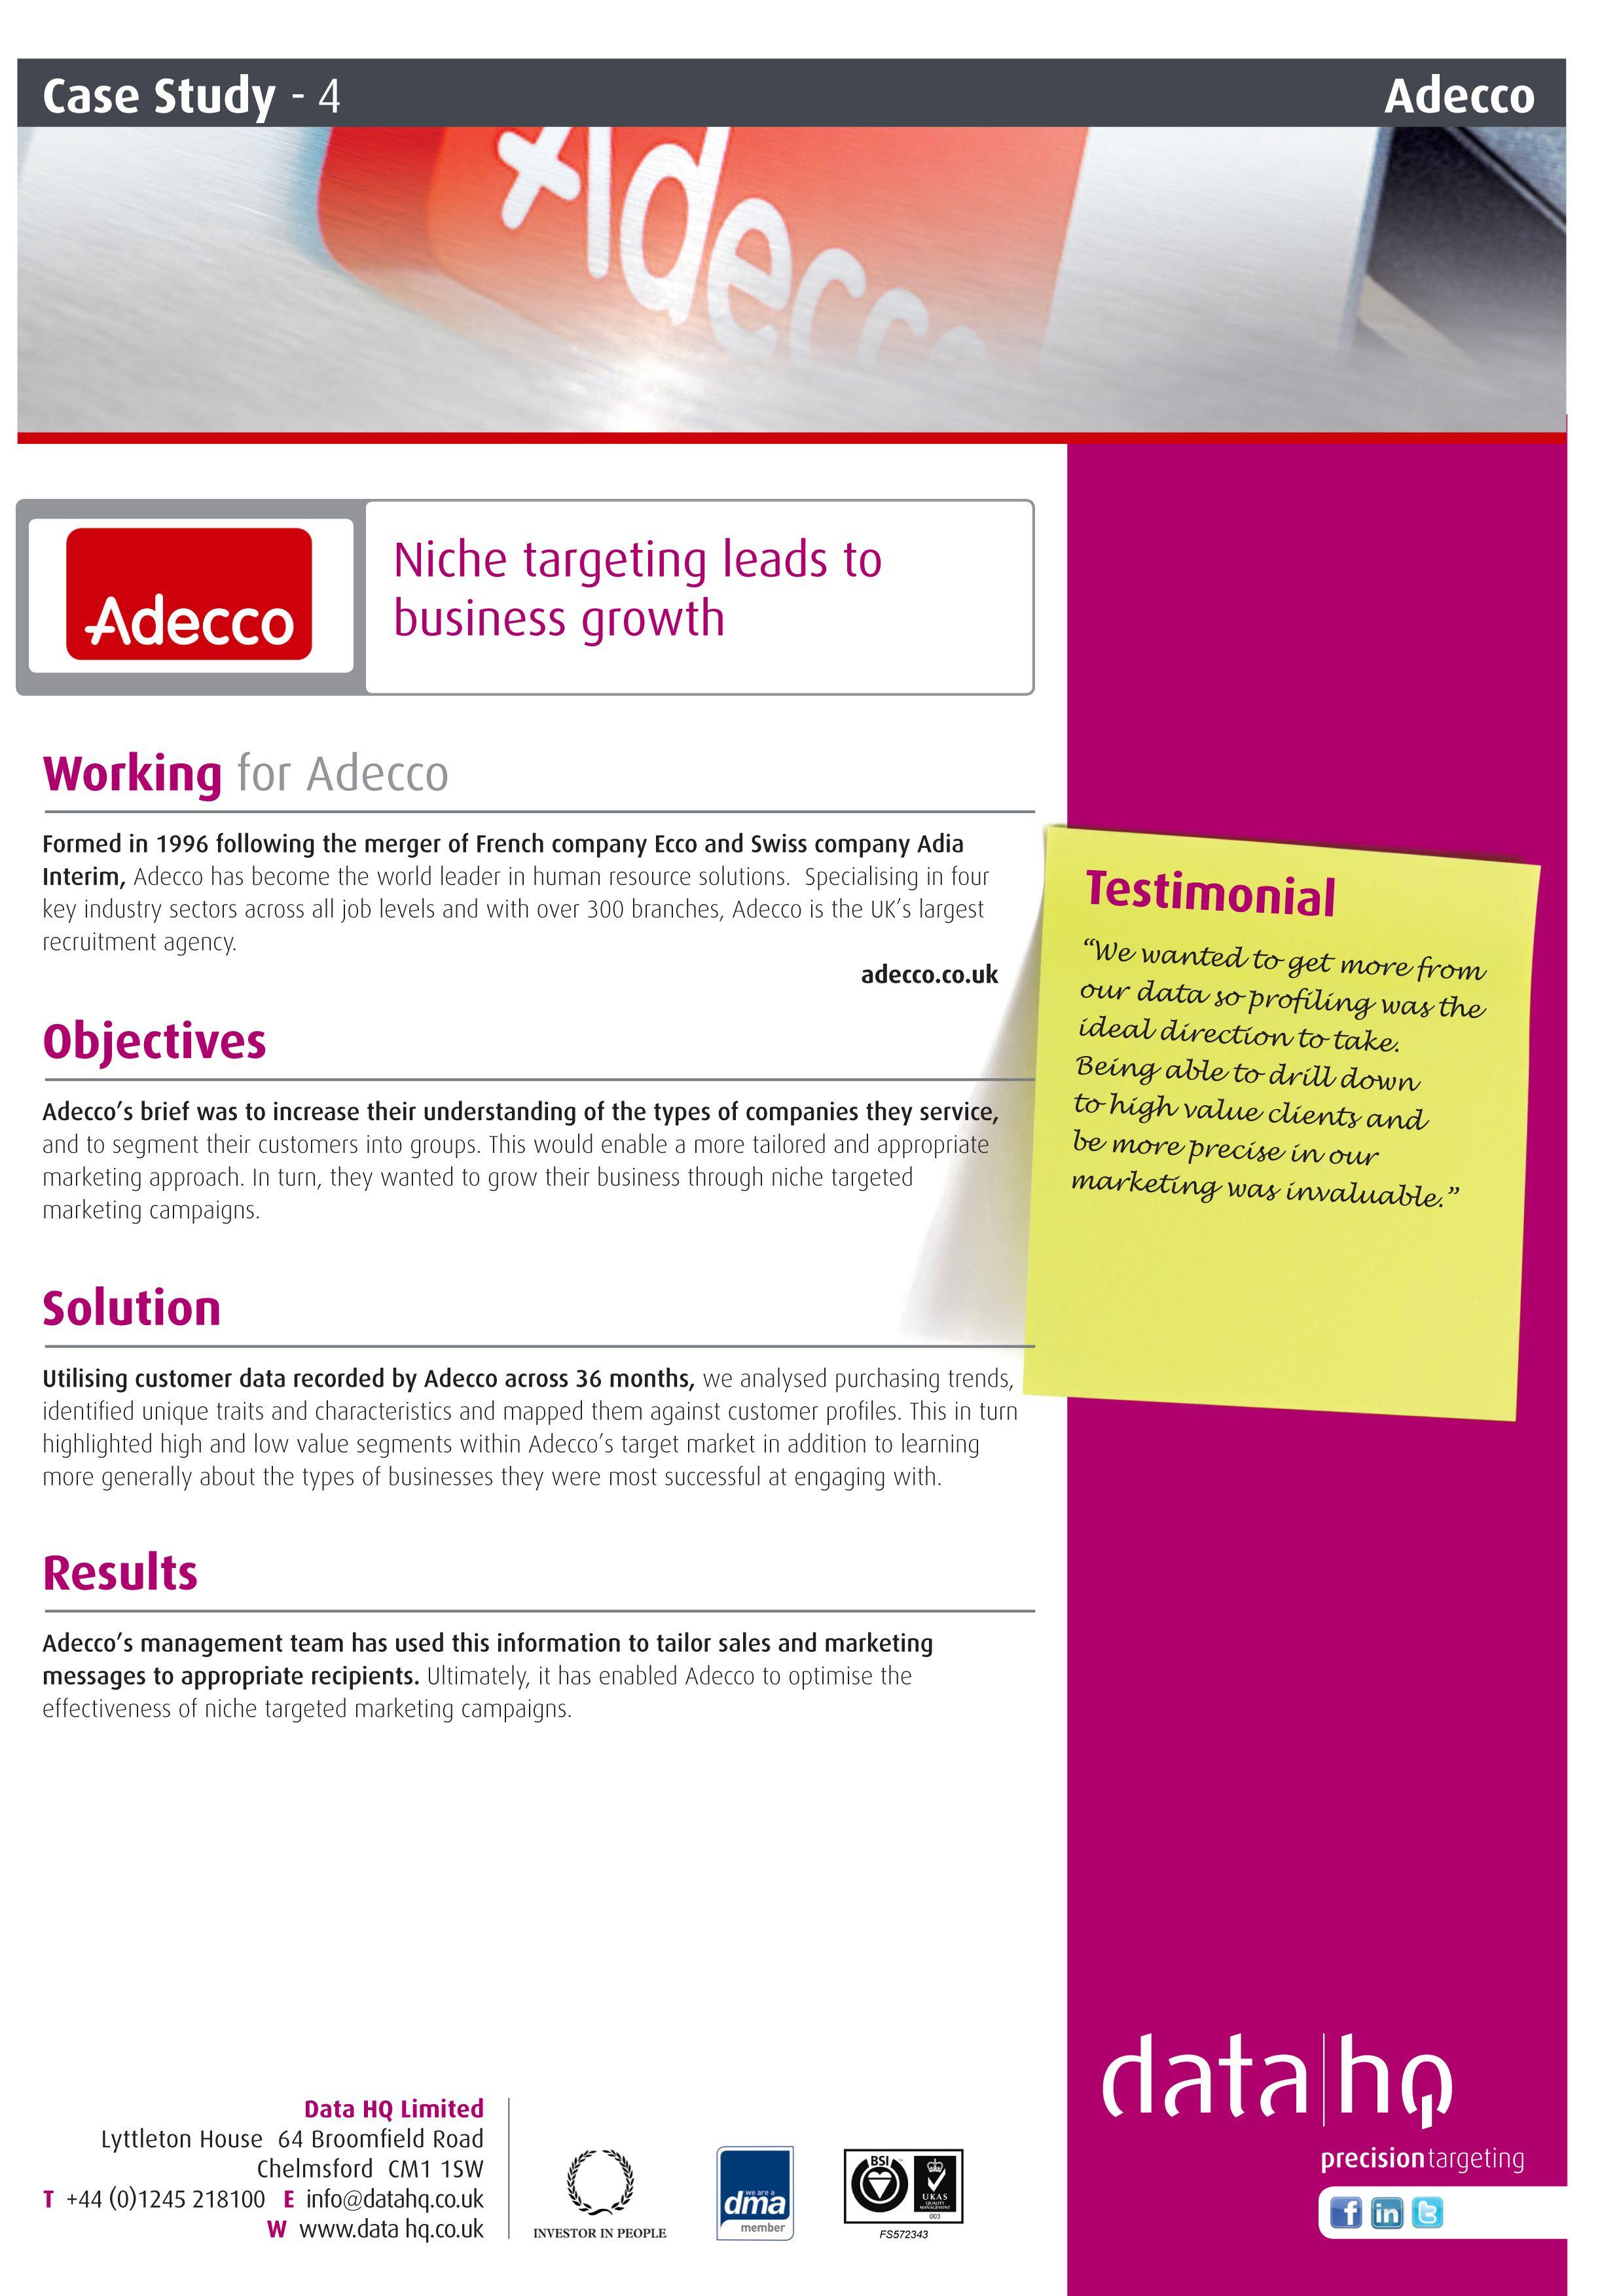 Adecco Case Study Marketing Case Study Anglia Ruskin University Study